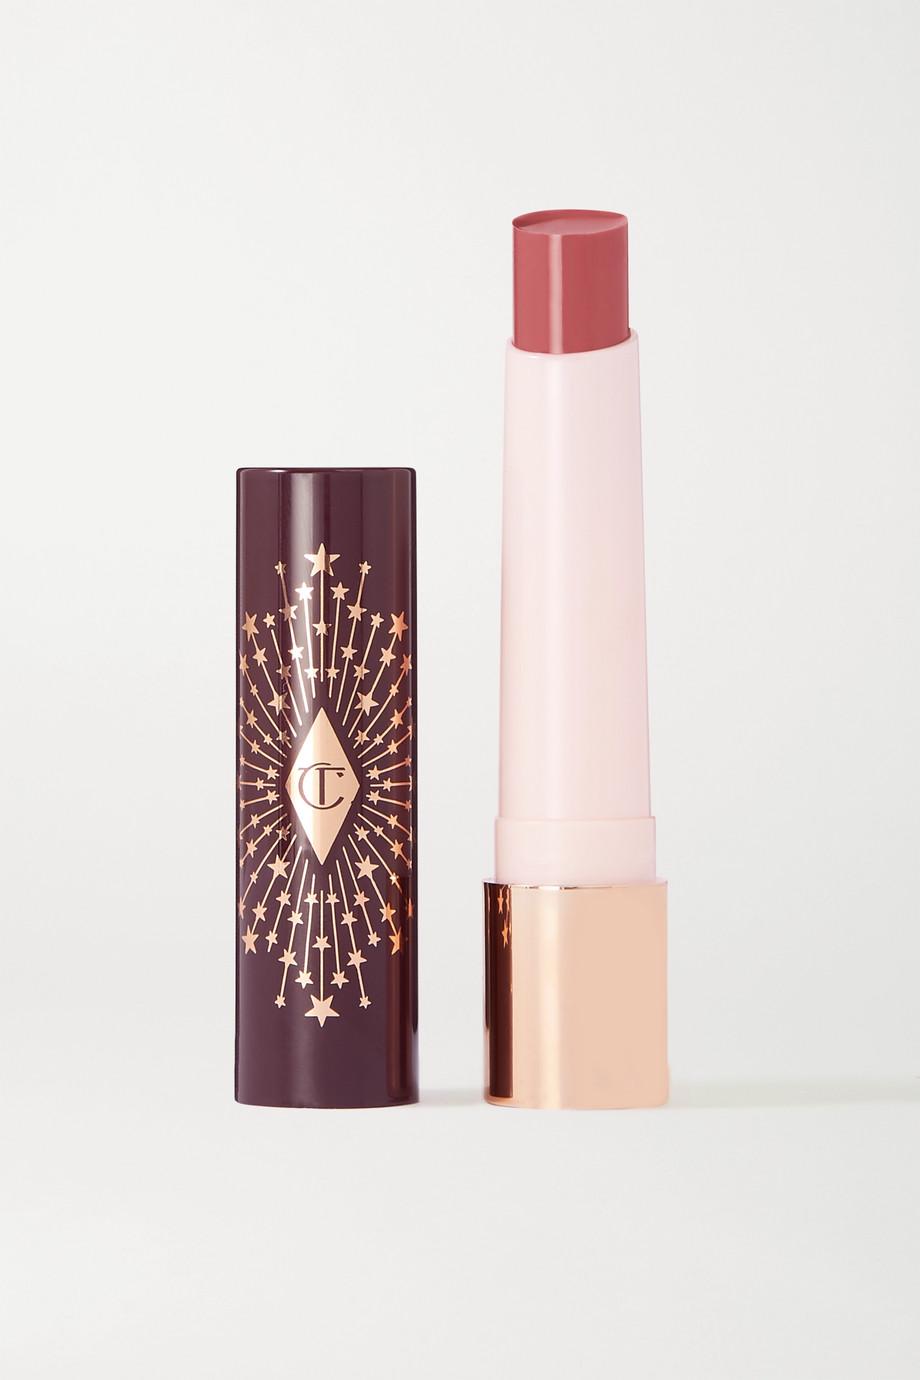 Charlotte Tilbury Hyaluronic Happikiss Lipstick Balm - Happipetal